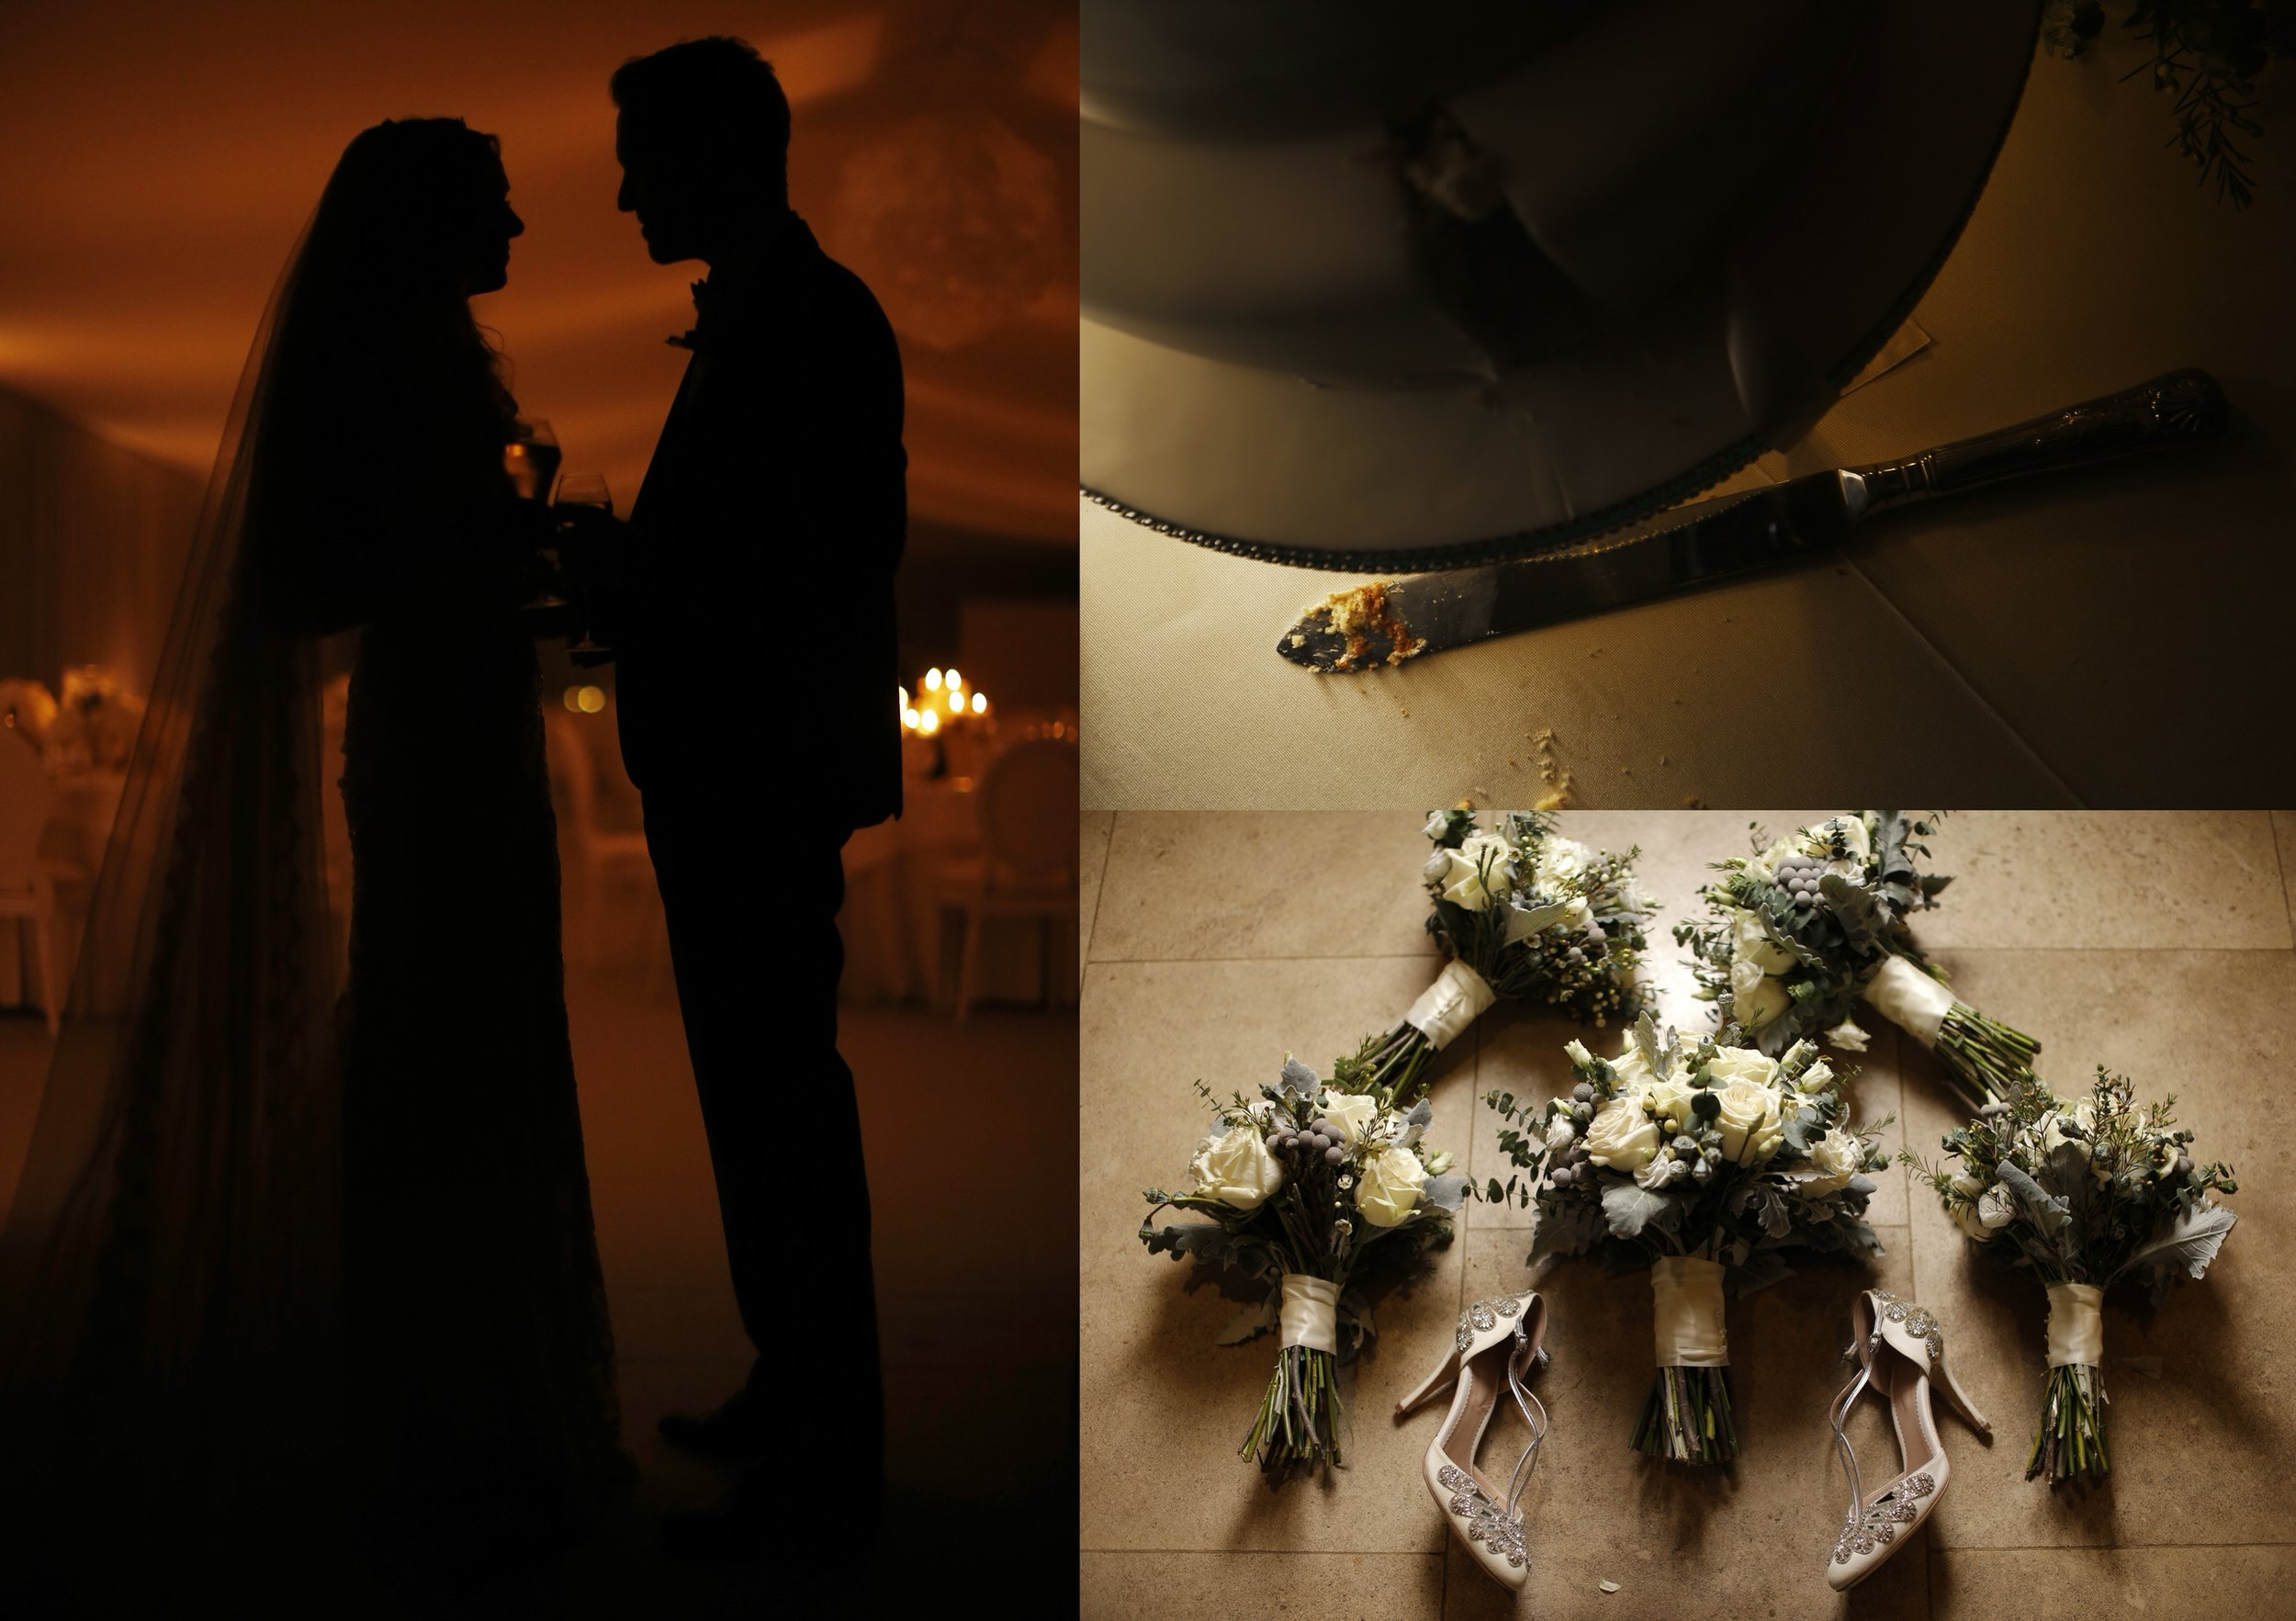 brett-harkness-winter-wedding-uk-wedding-photographer_0025.jpg